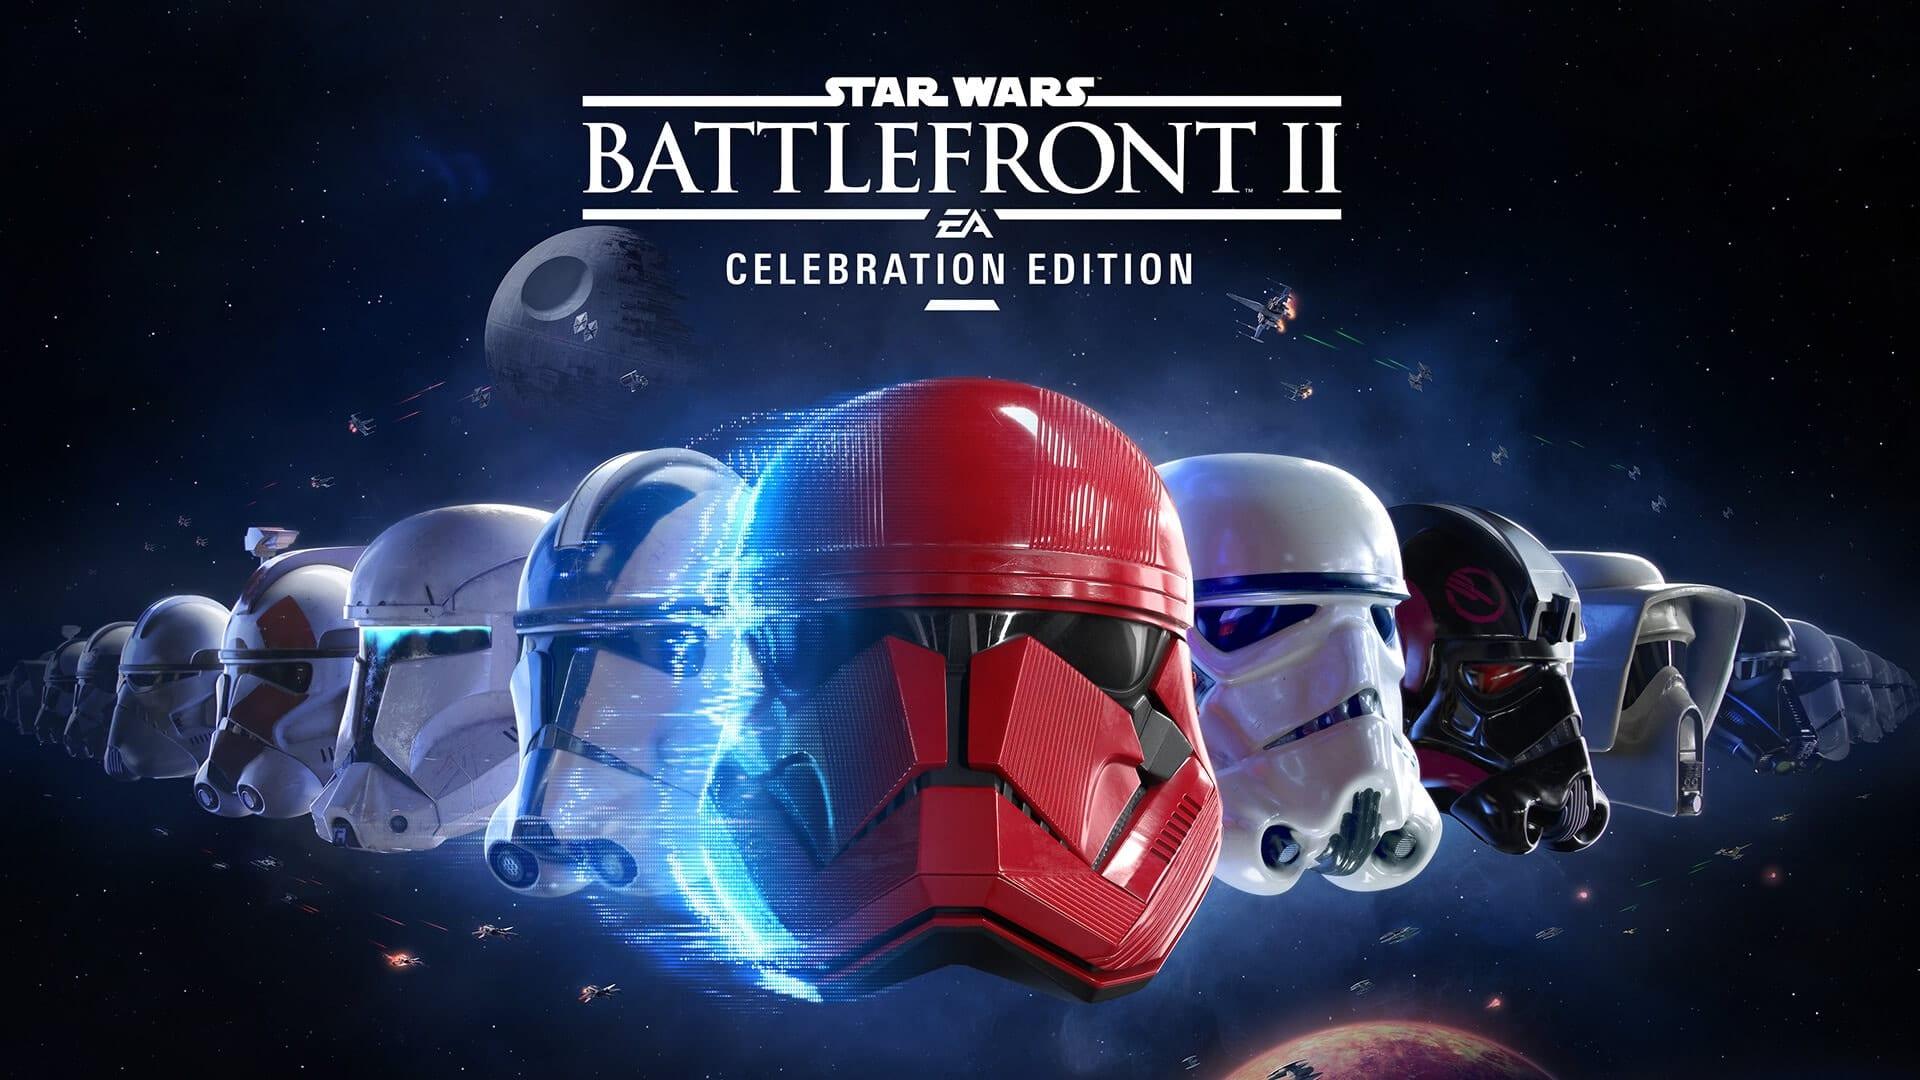 battlefront 2 celebration edition spend credits